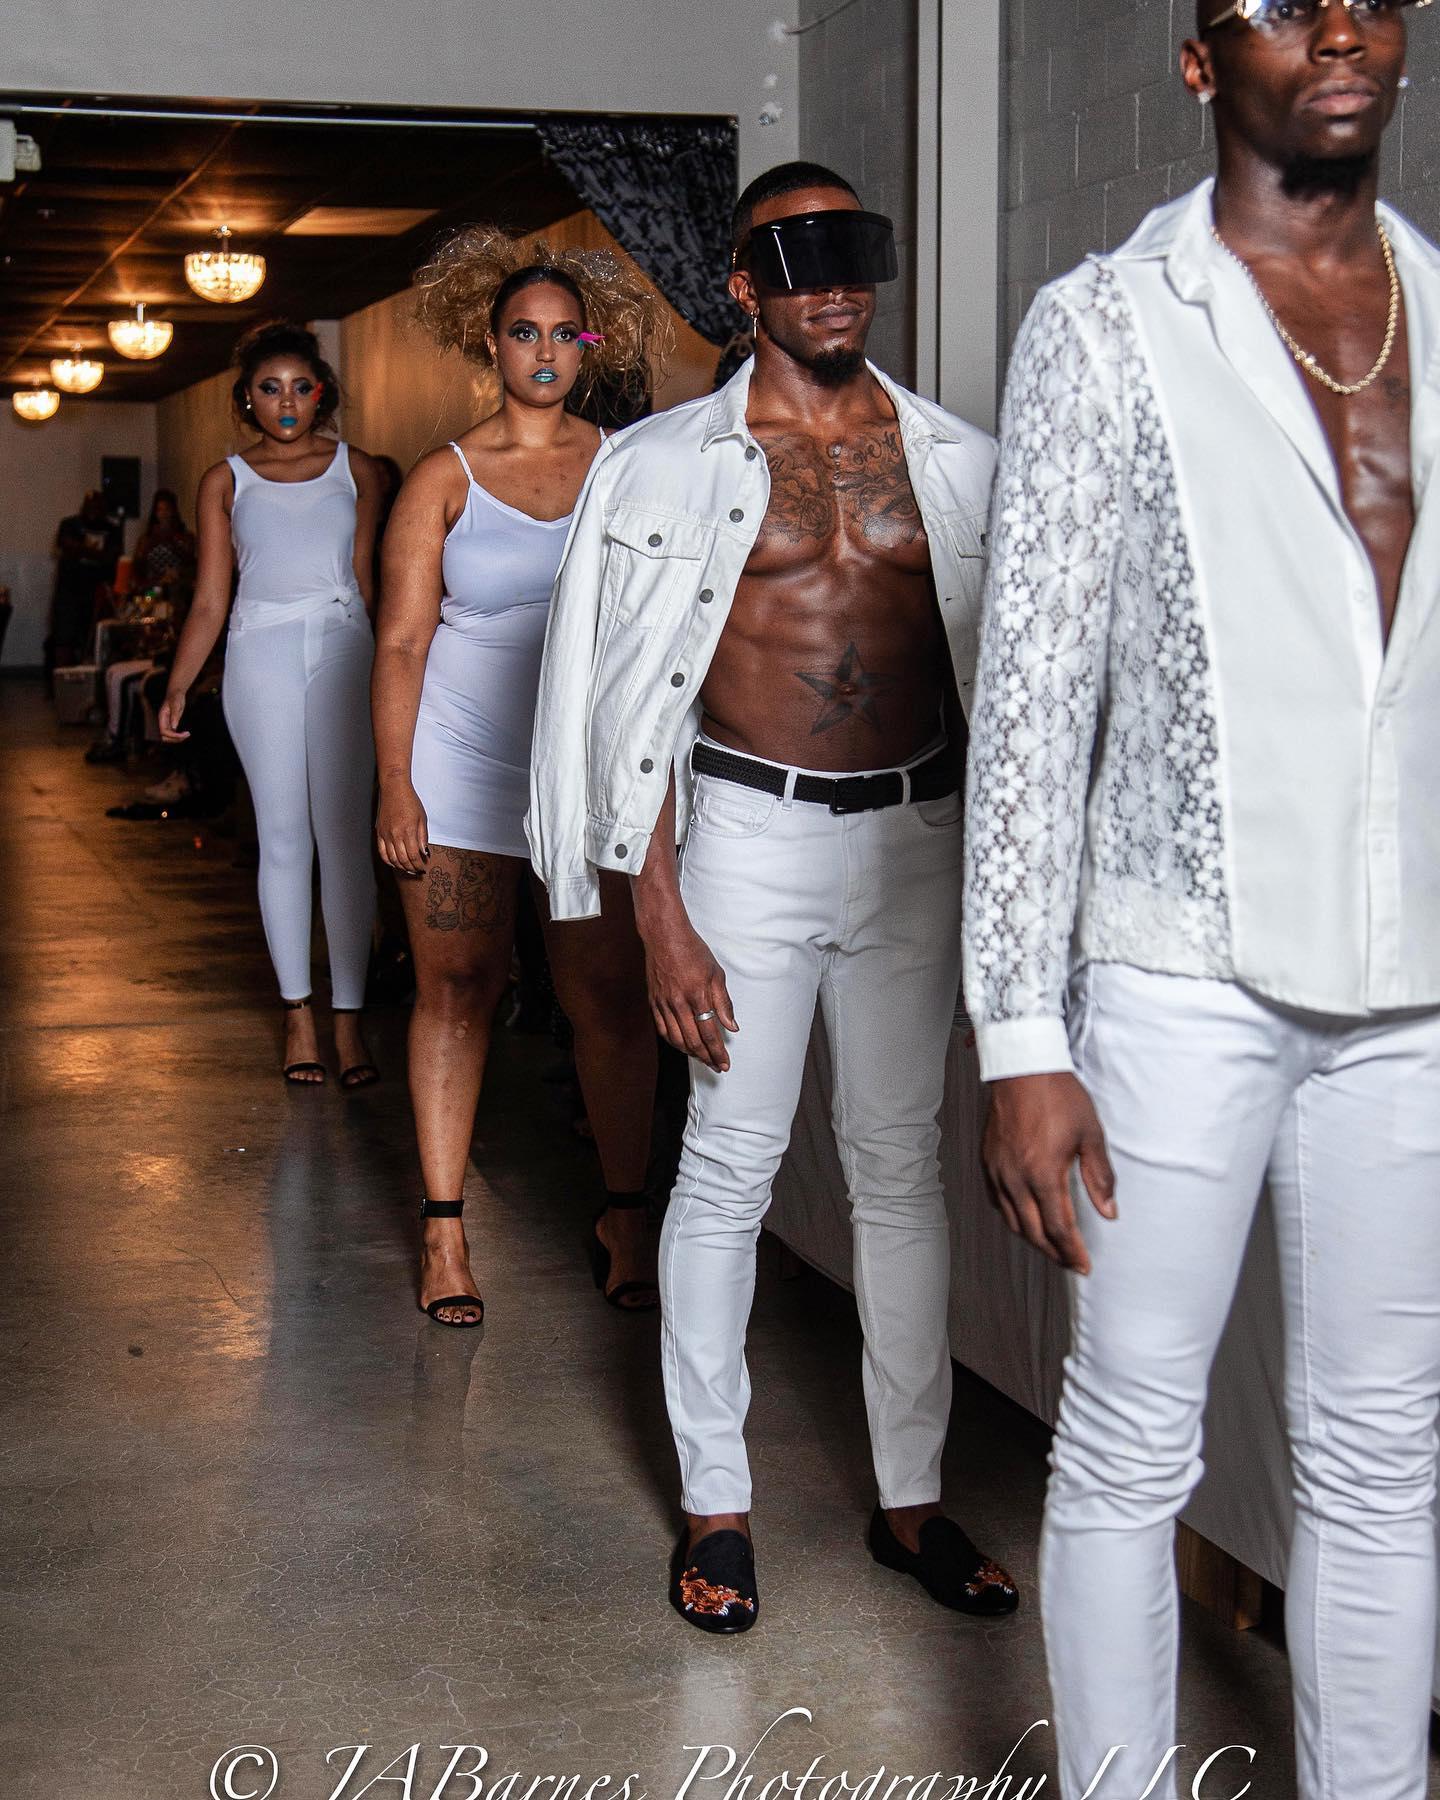 models getting ready to walk